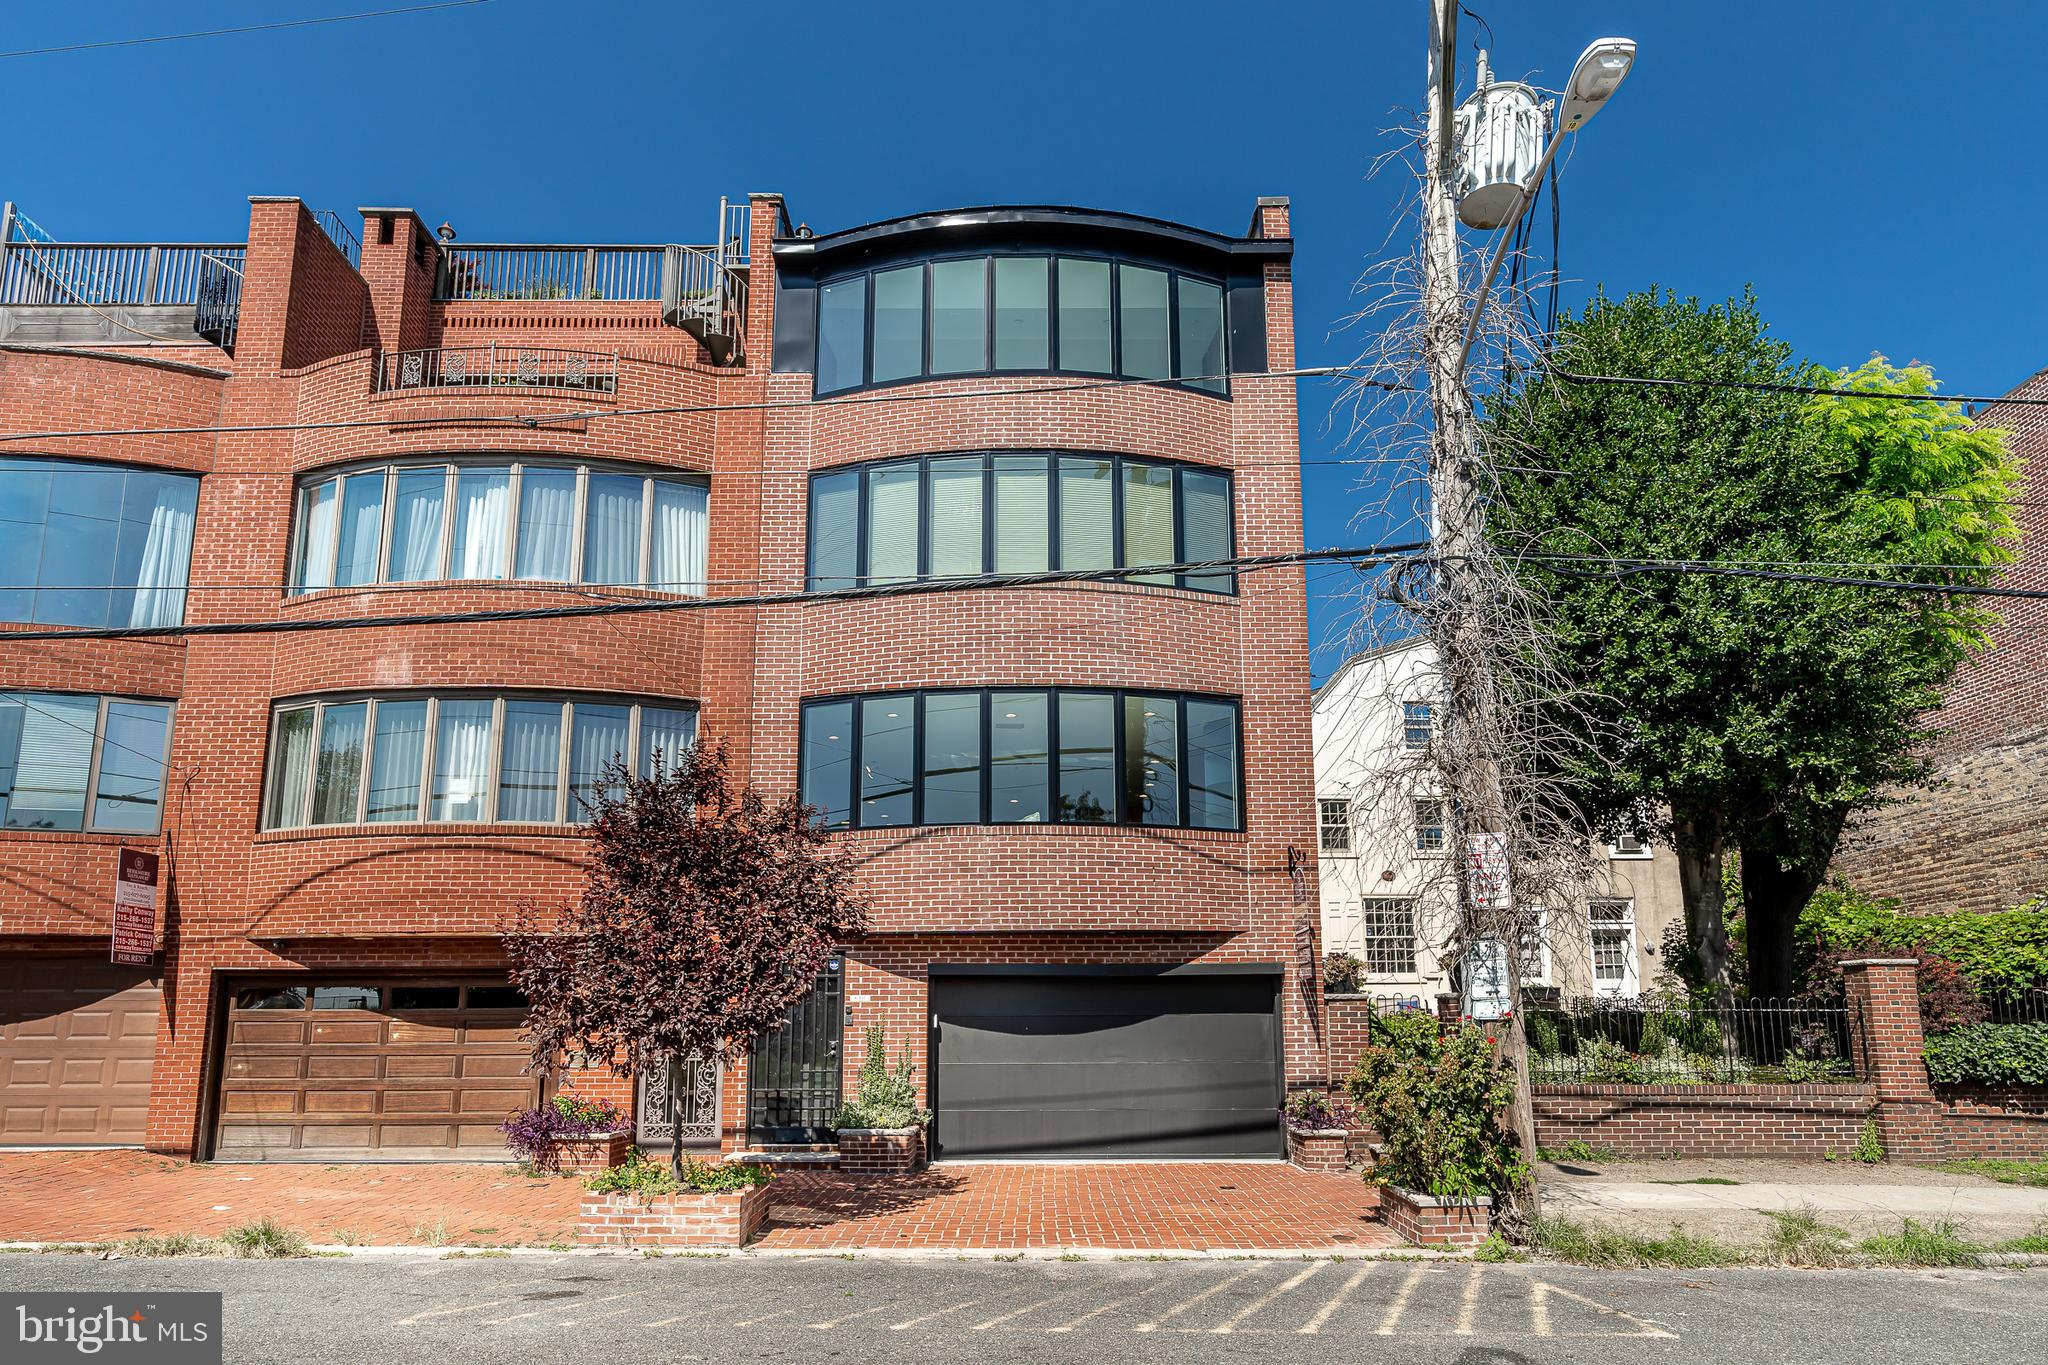 610 S FRONT STREET, PHILADELPHIA, PA 19147